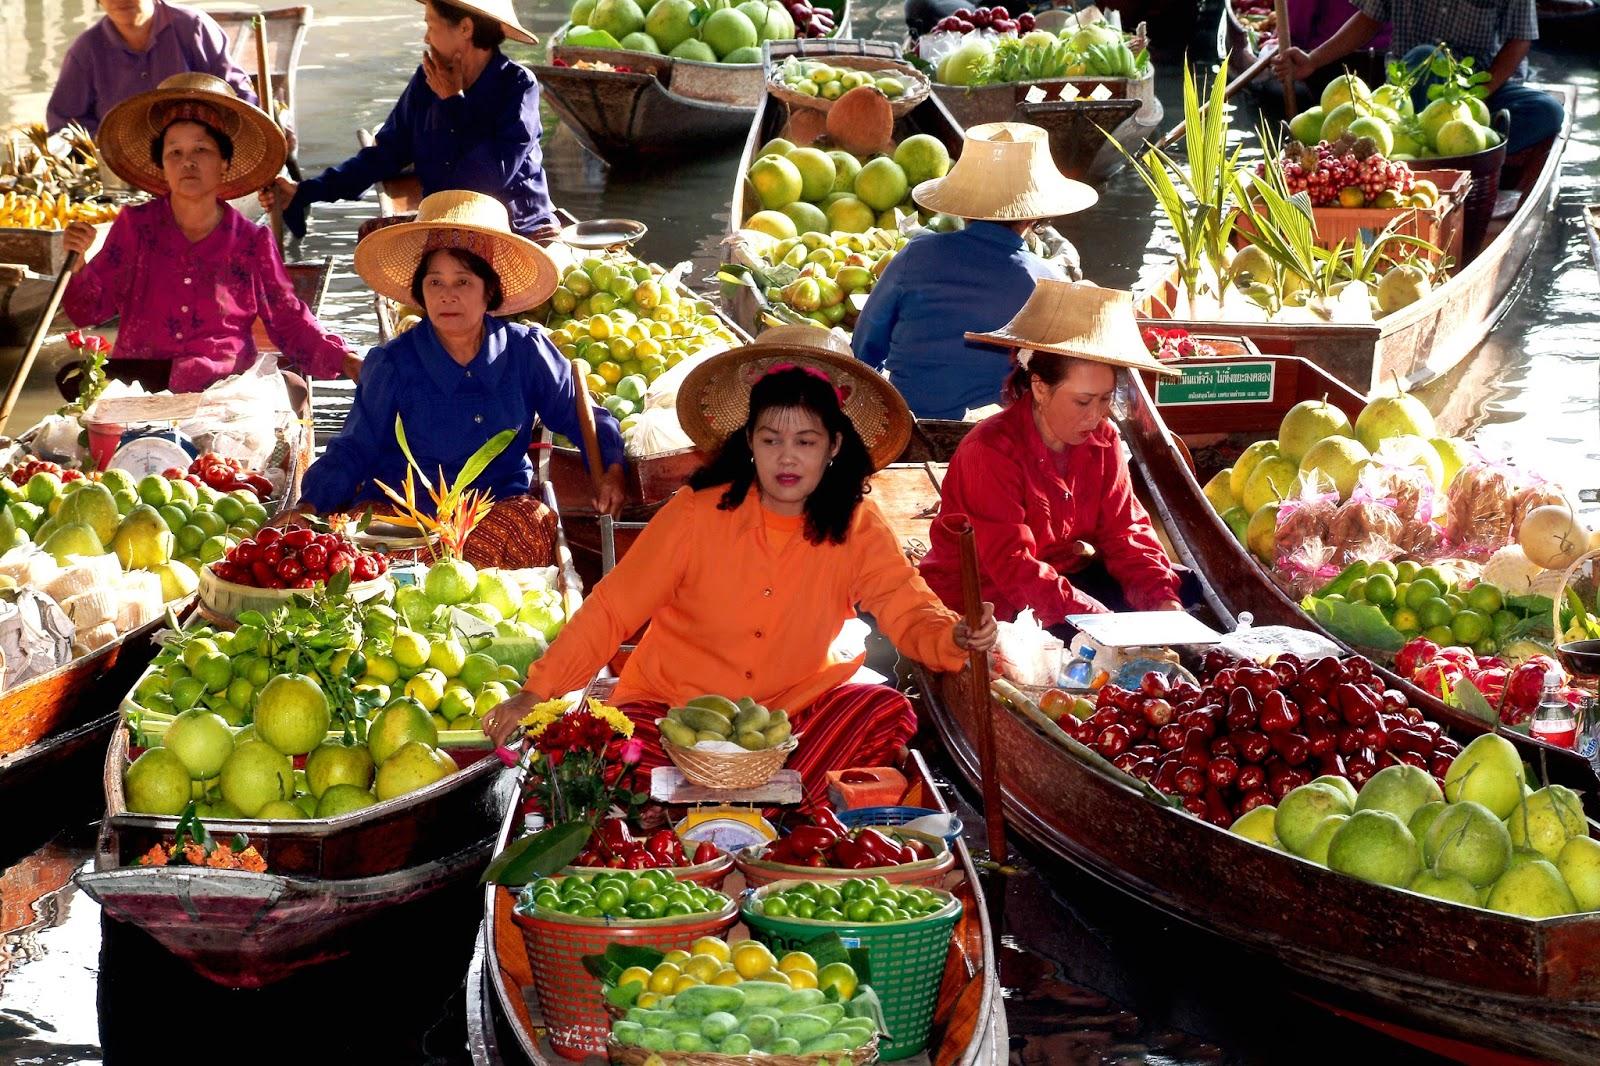 Visit the Floating Market in Thailand | Damnoen Saduak Floating Market